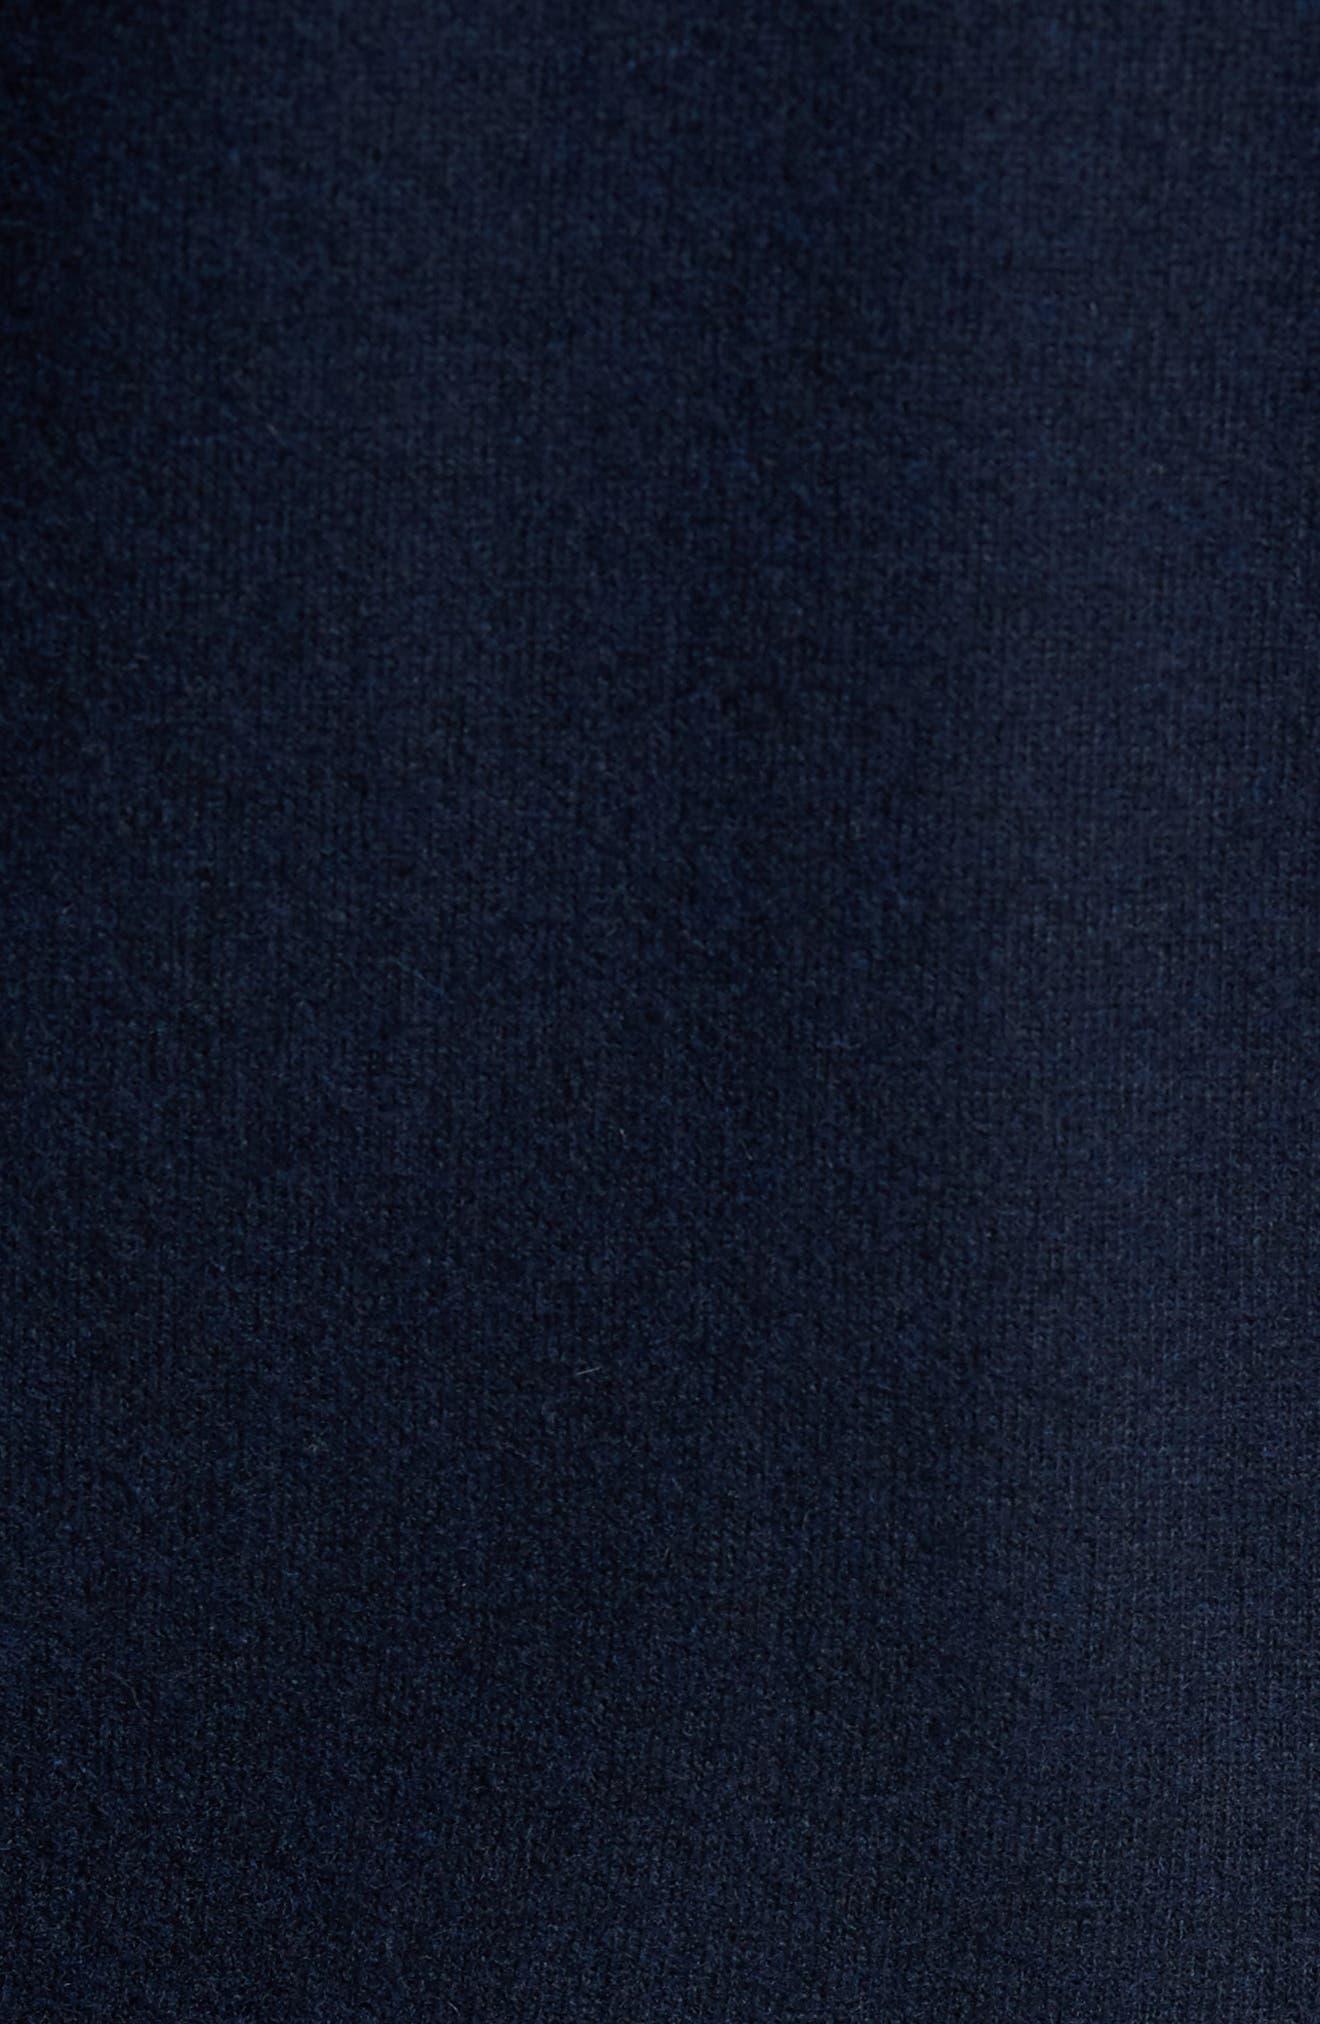 Wool Blend Hooded Cardigan,                             Alternate thumbnail 5, color,                             Navy Iris